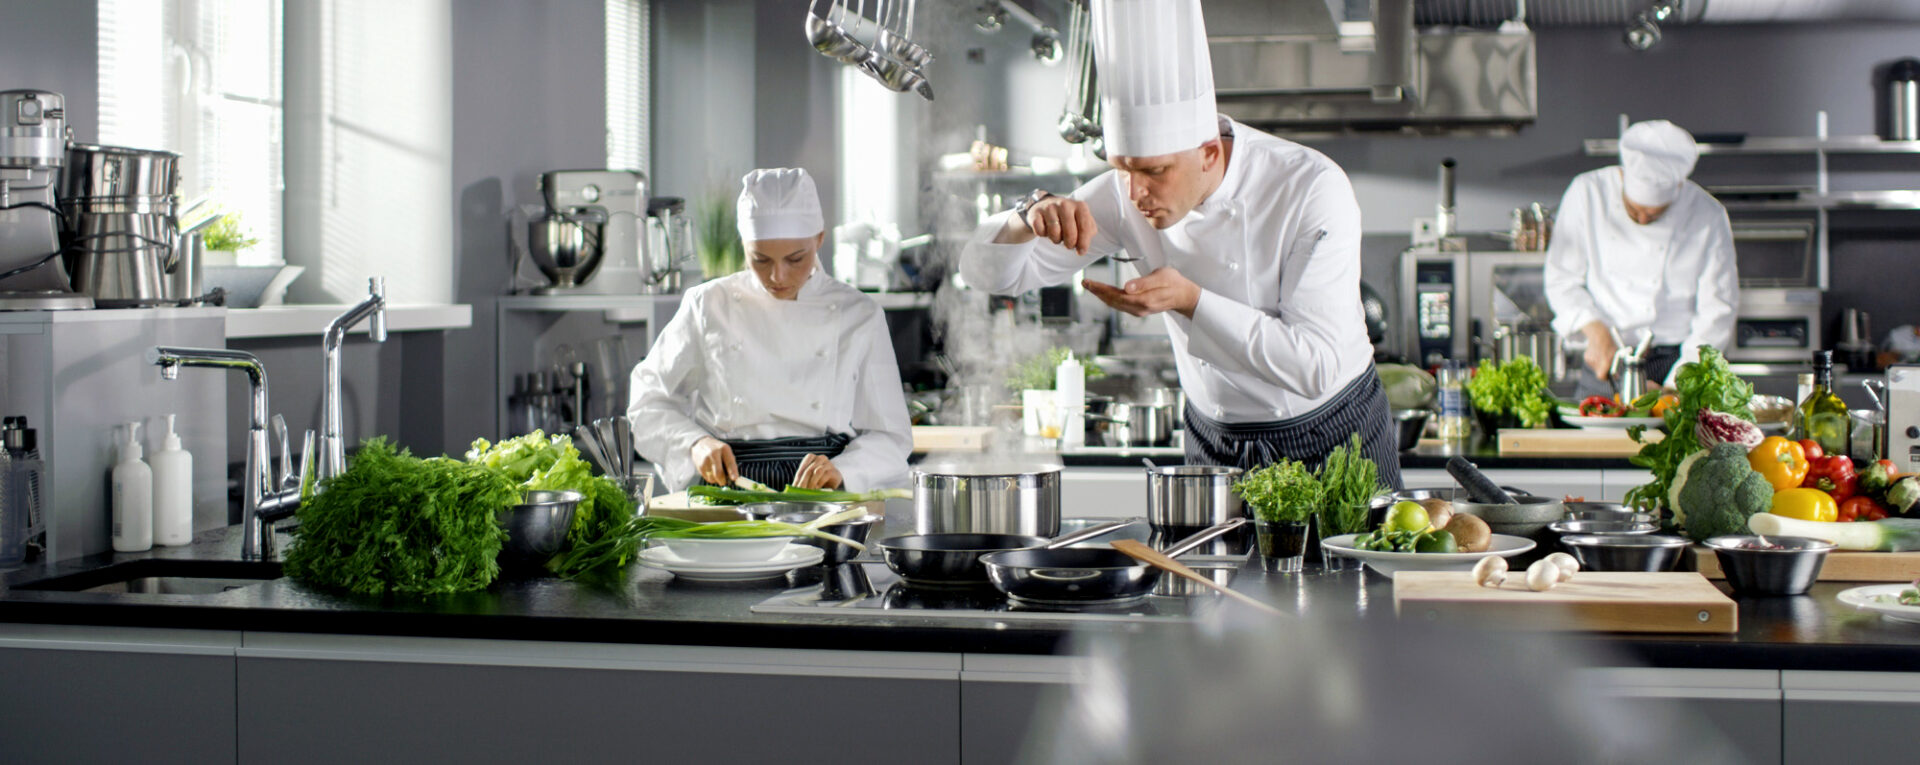 Chef Connexion Customers